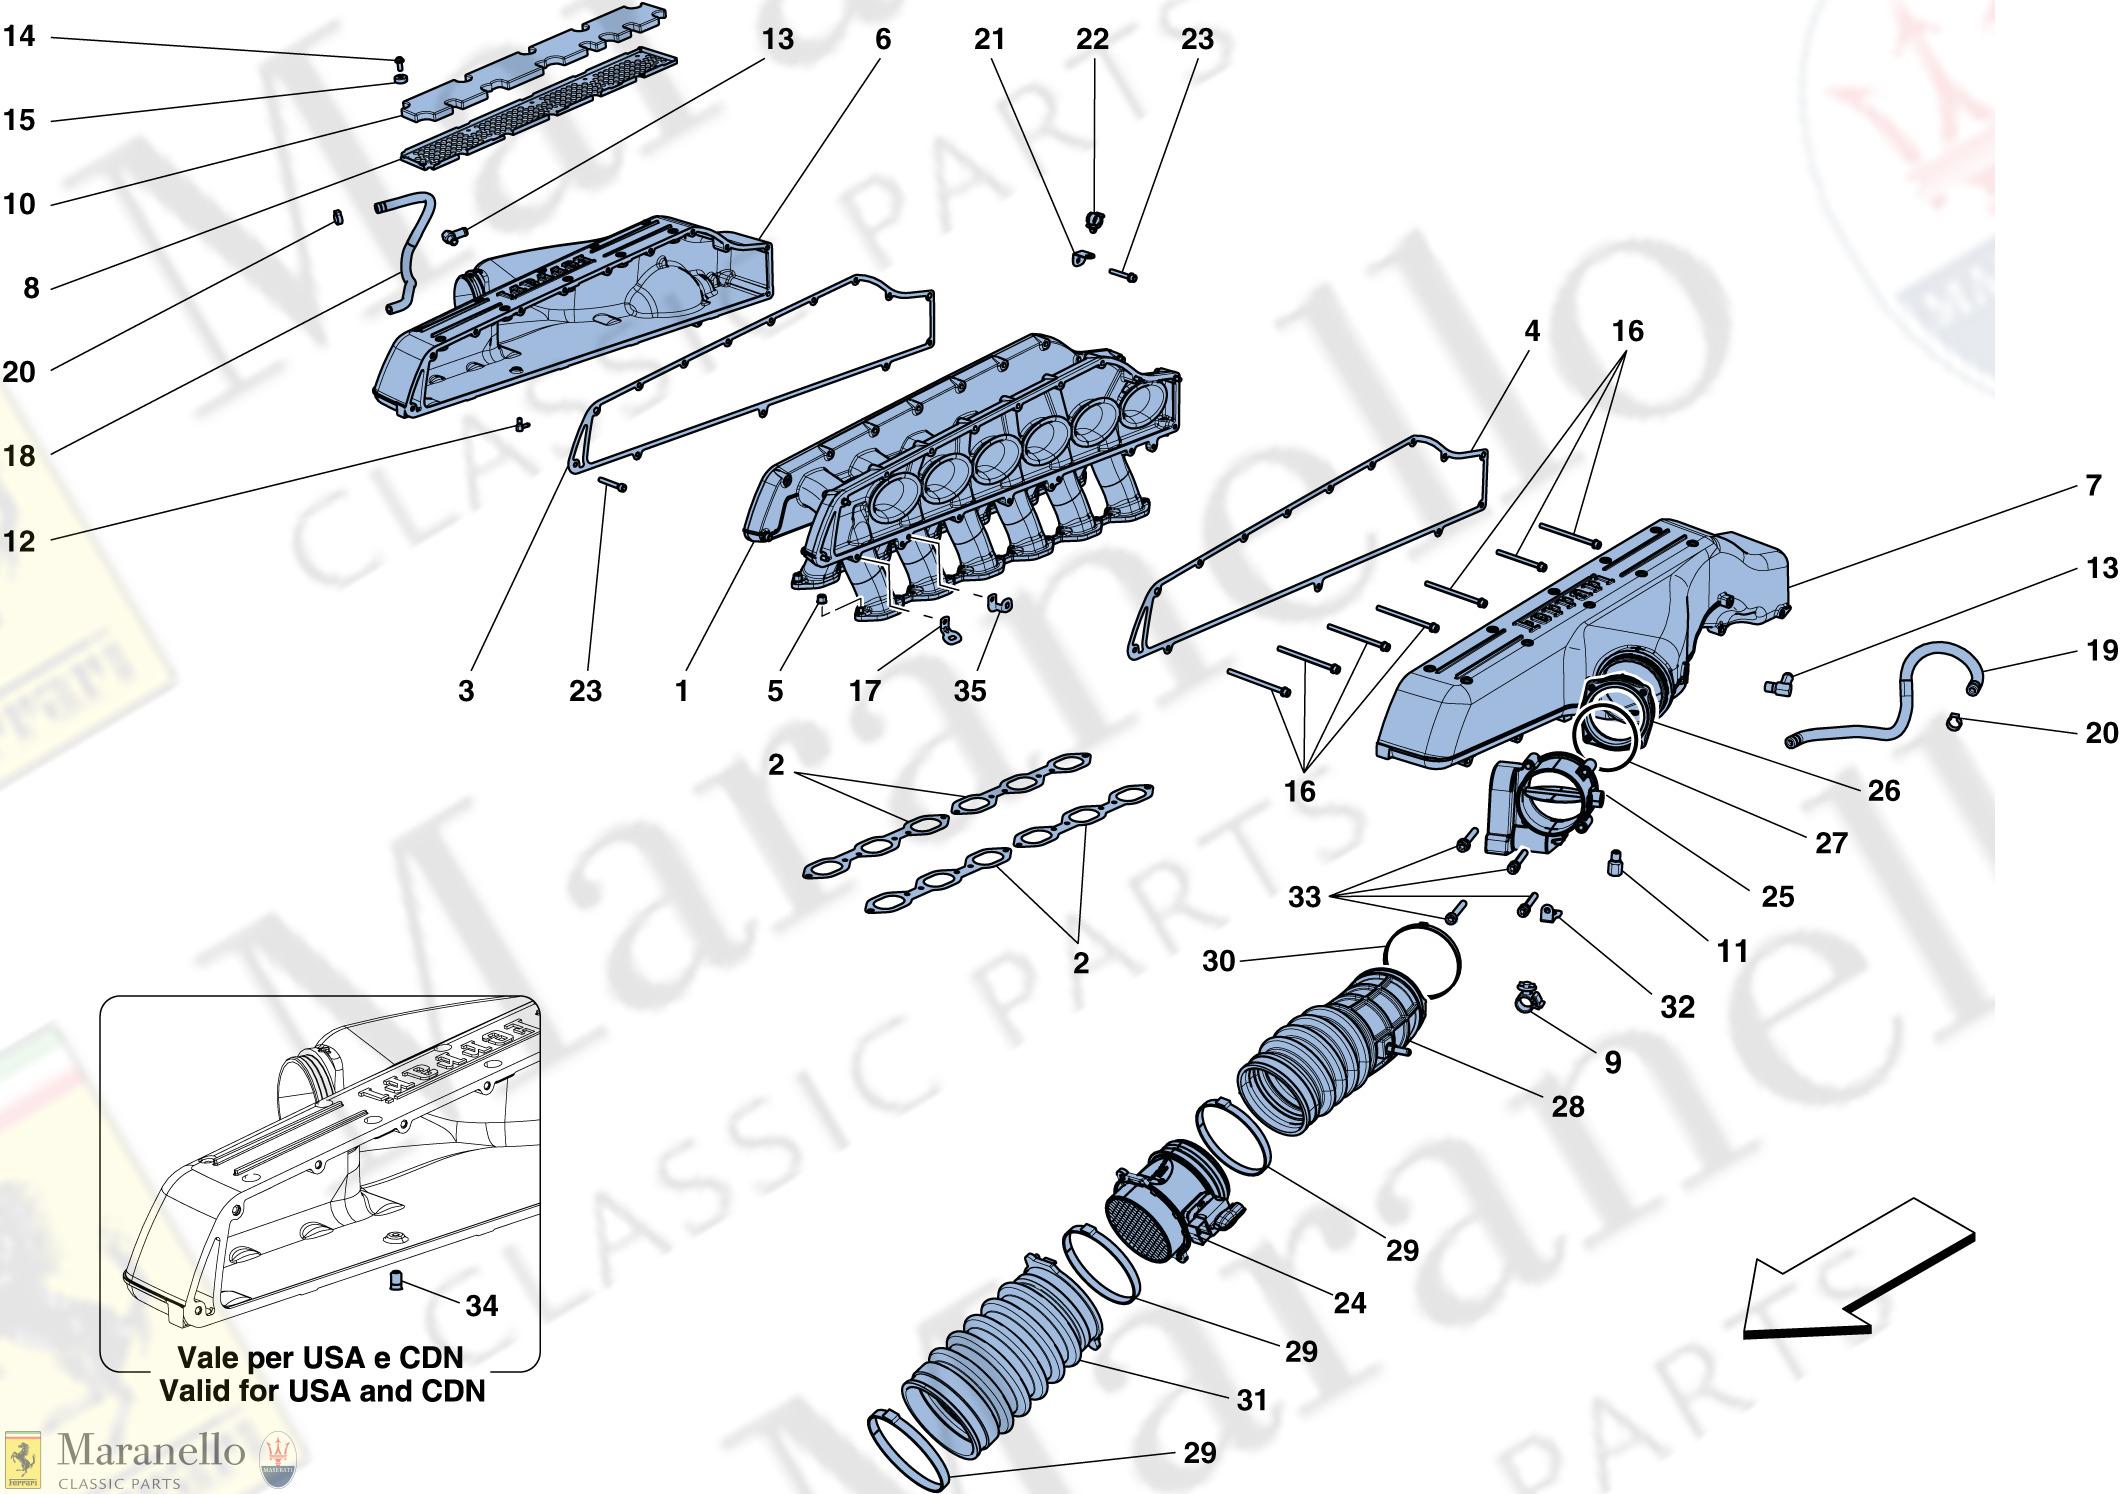 012 - intake manifold parts diagram for ferrari ff   maranello classic parts  maranello classic parts